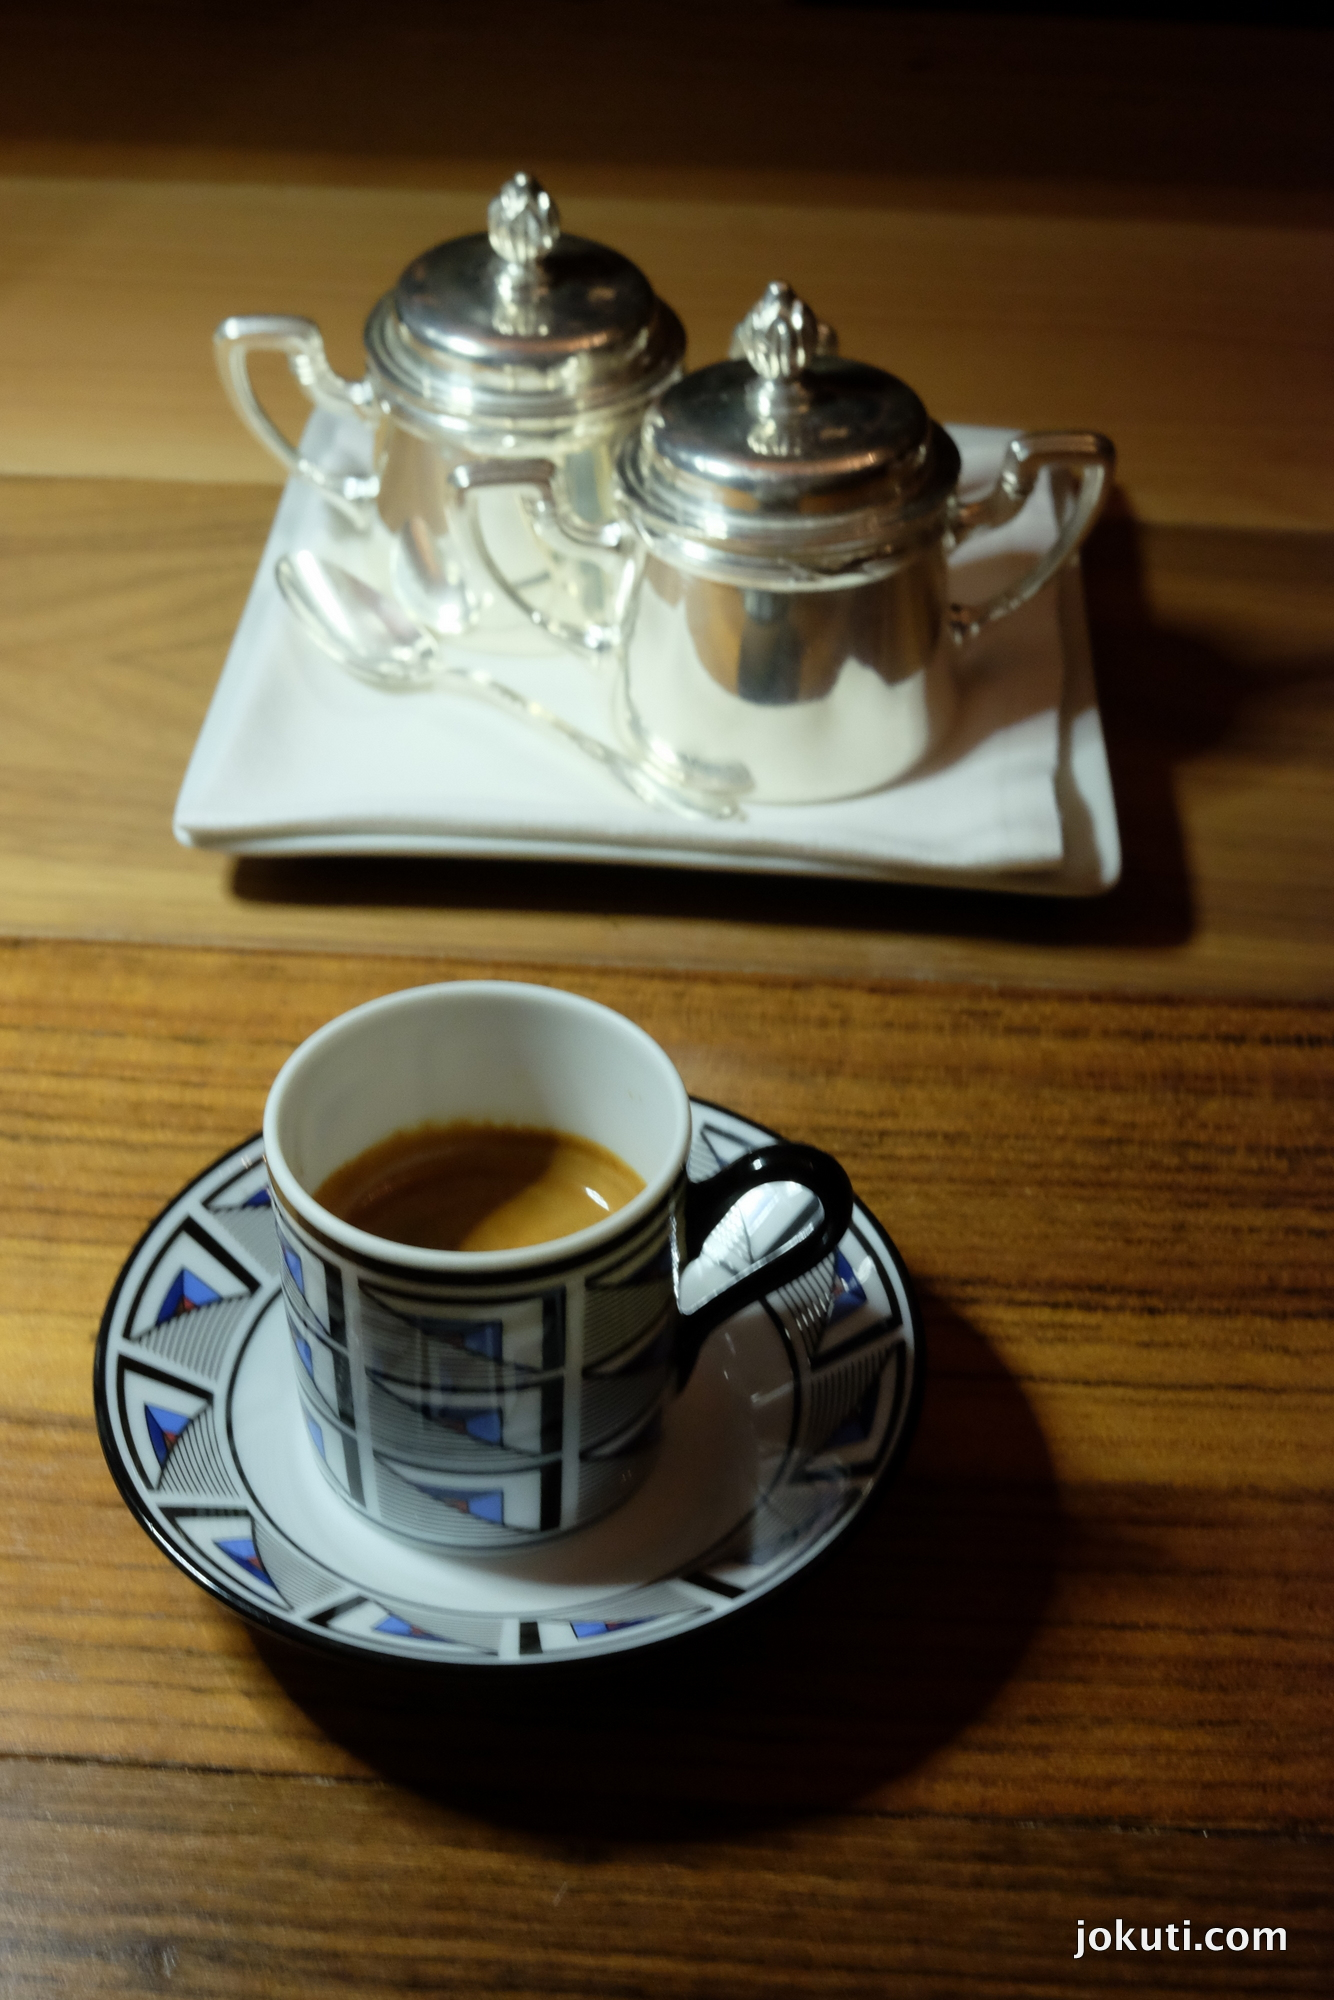 dscf5480_osteria_francescana_modena_italy_massimo_bottura_michelin_reitbauer_restaurant_vilagevo_jokuti_1.jpg